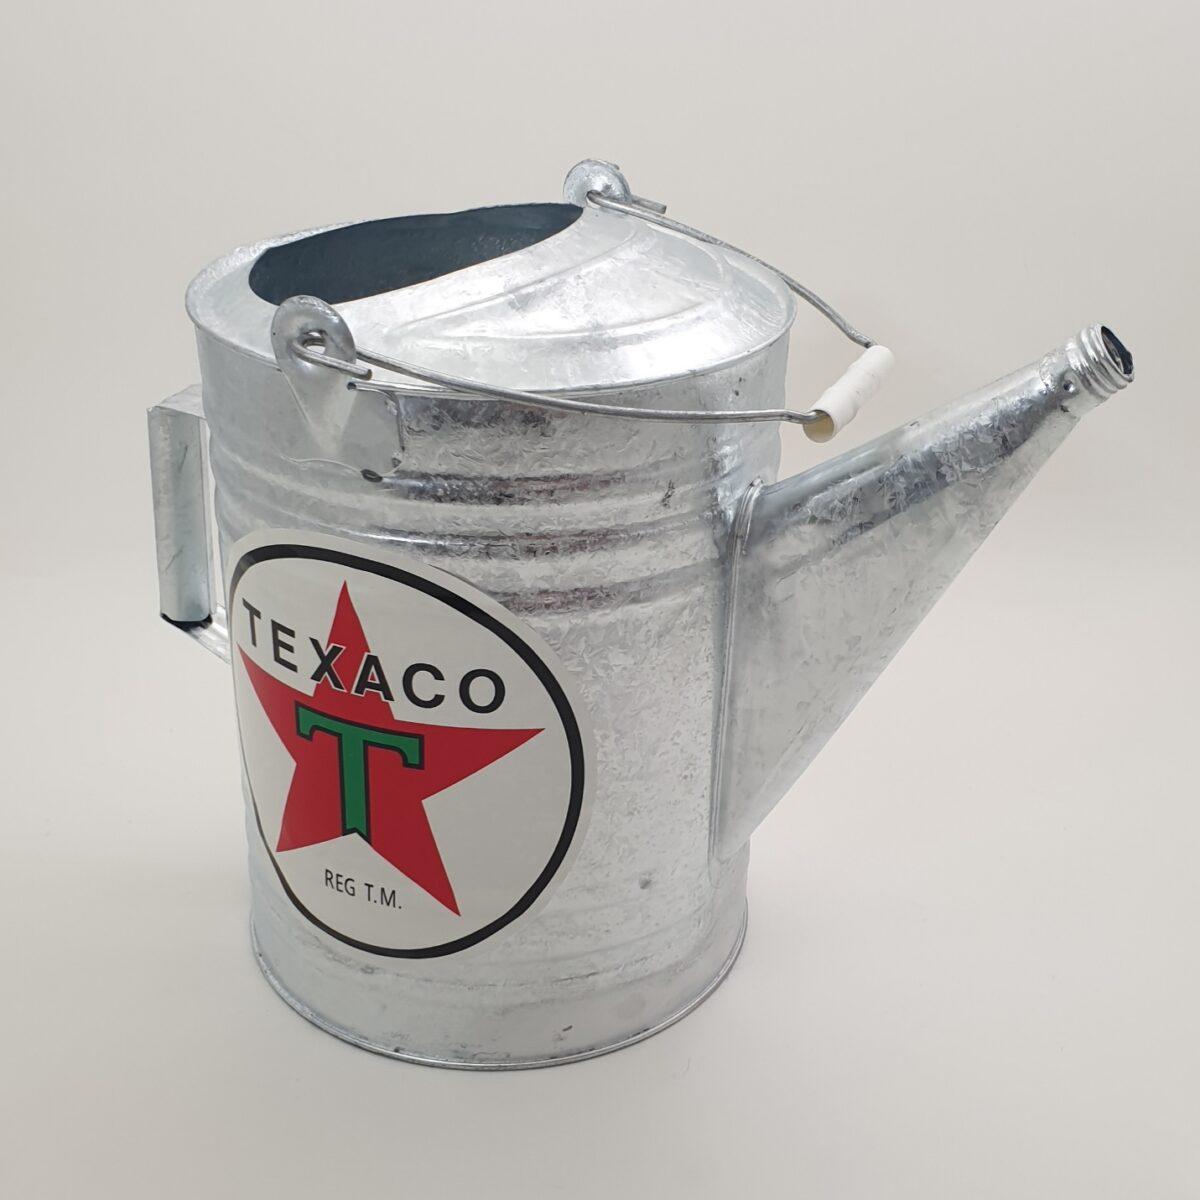 Seau Galvanise De Garagiste Texaco 3